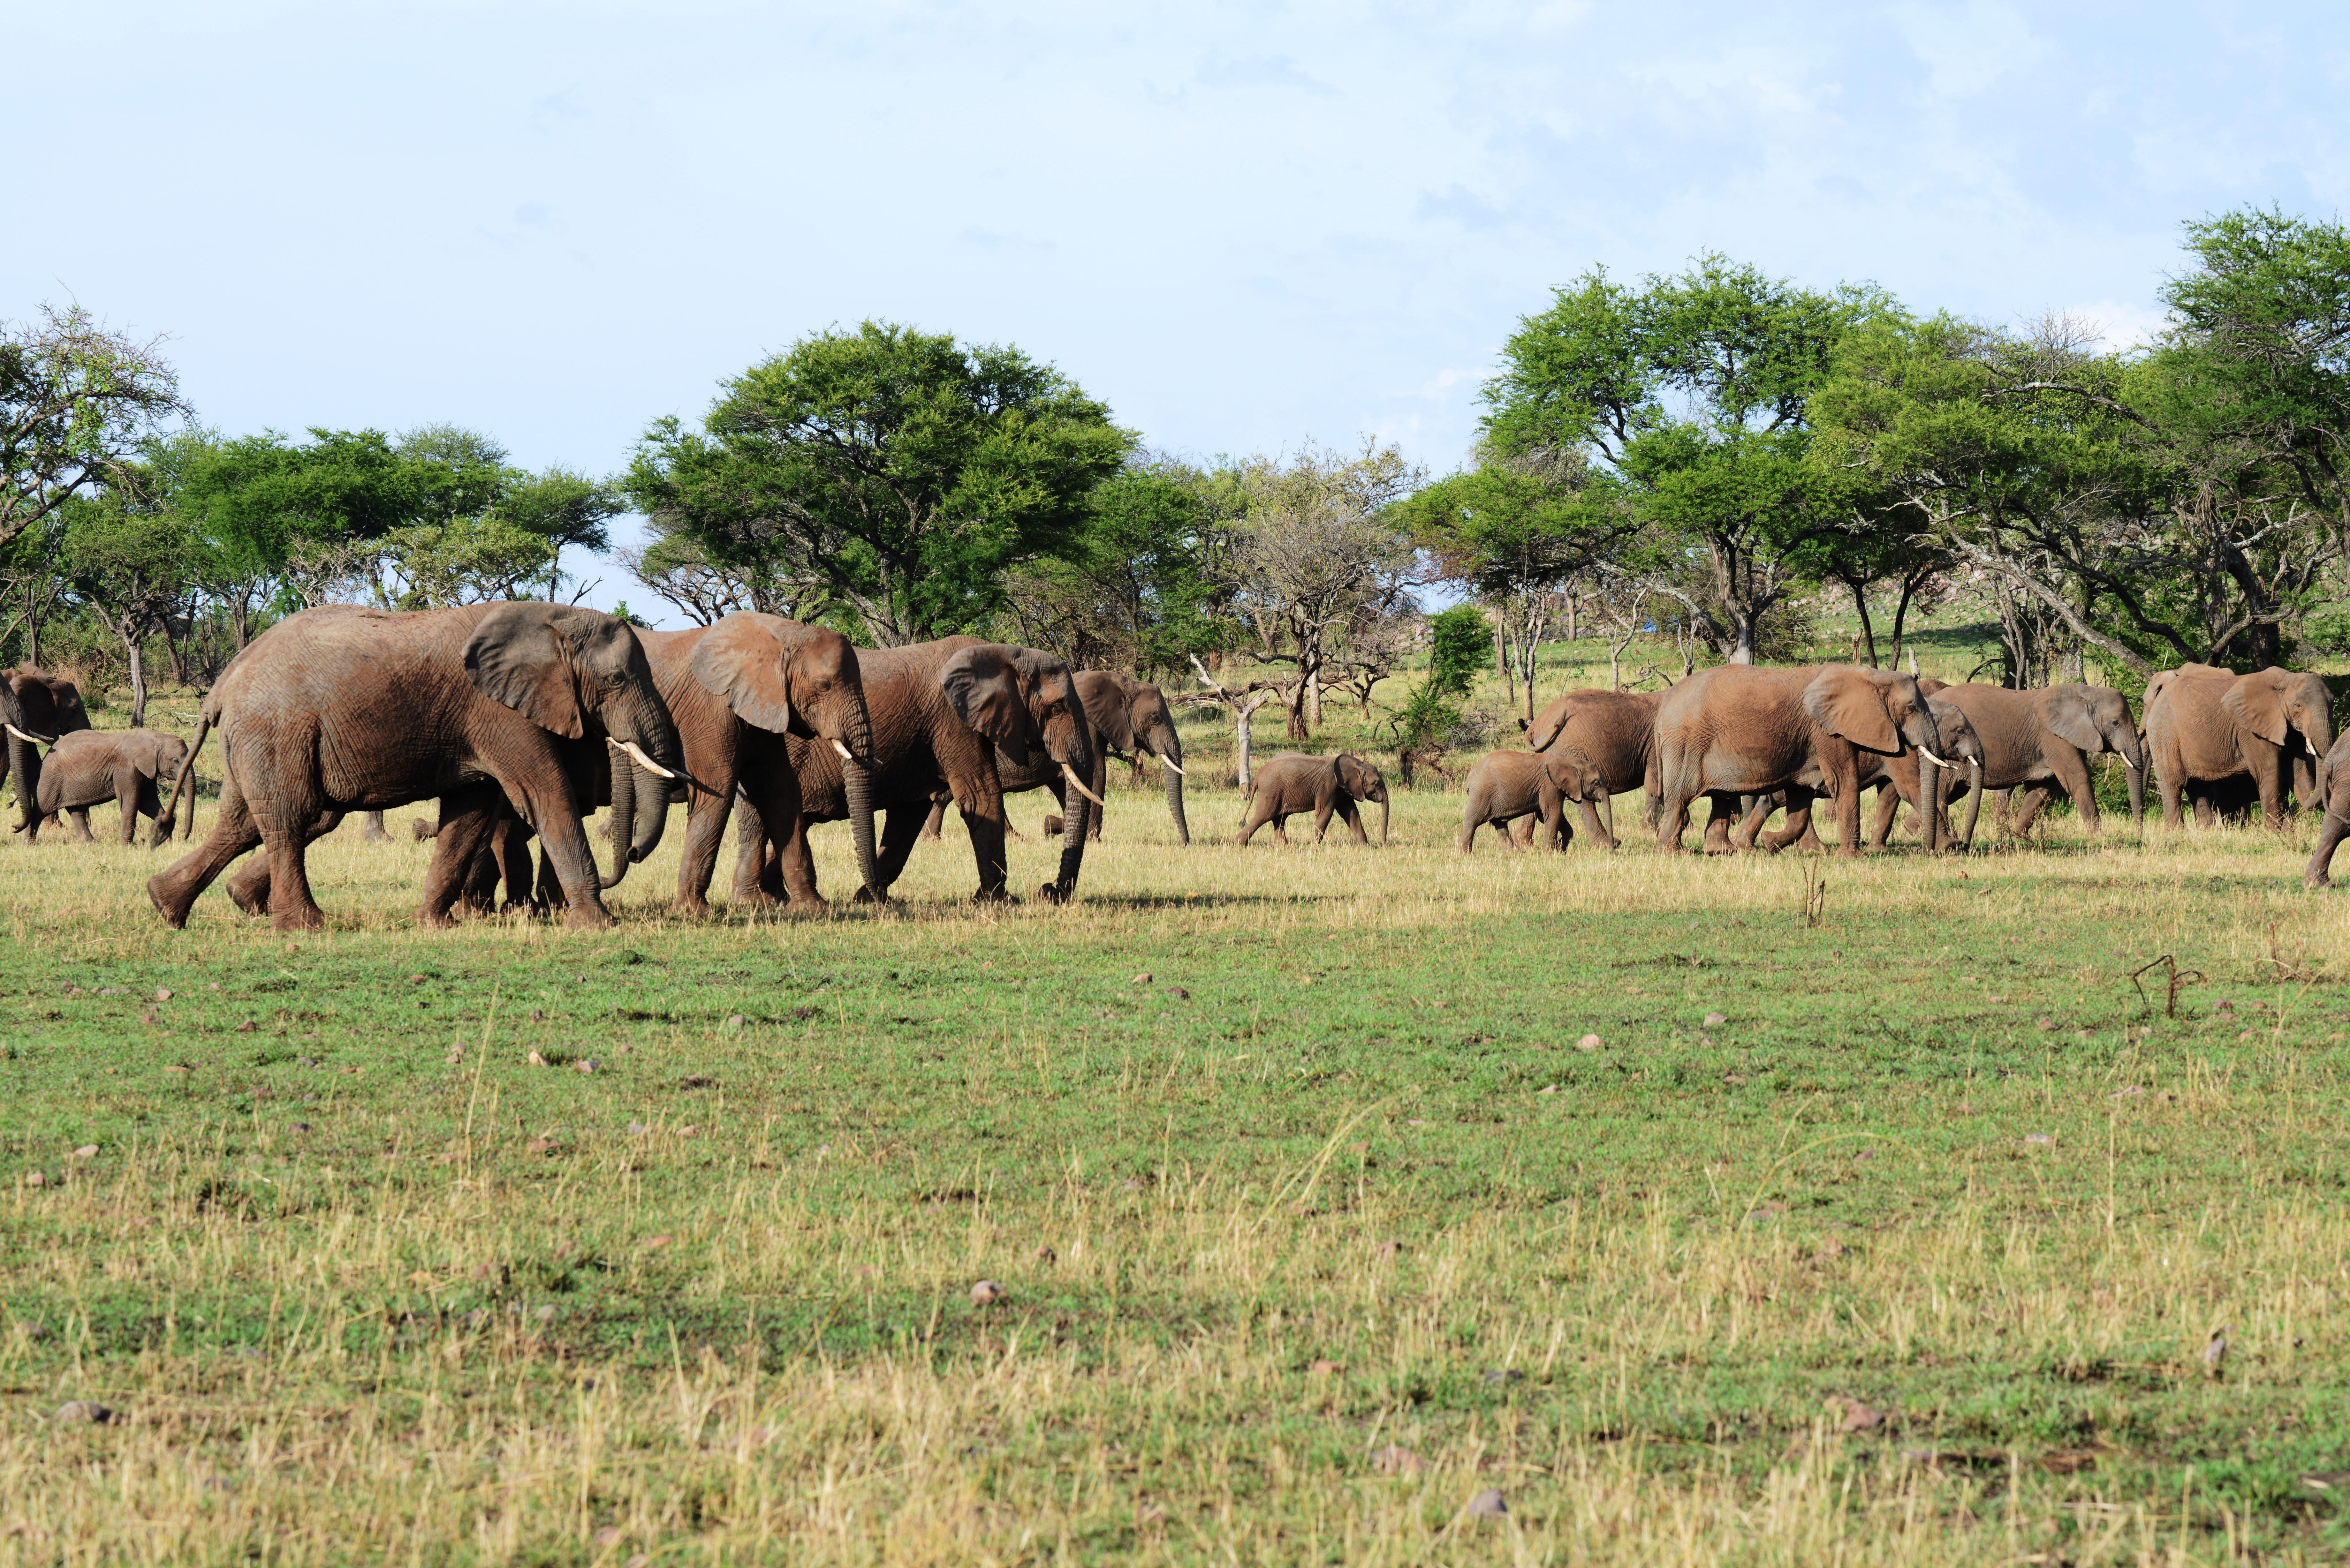 Tanzania (16.-25. Oktober 2012)